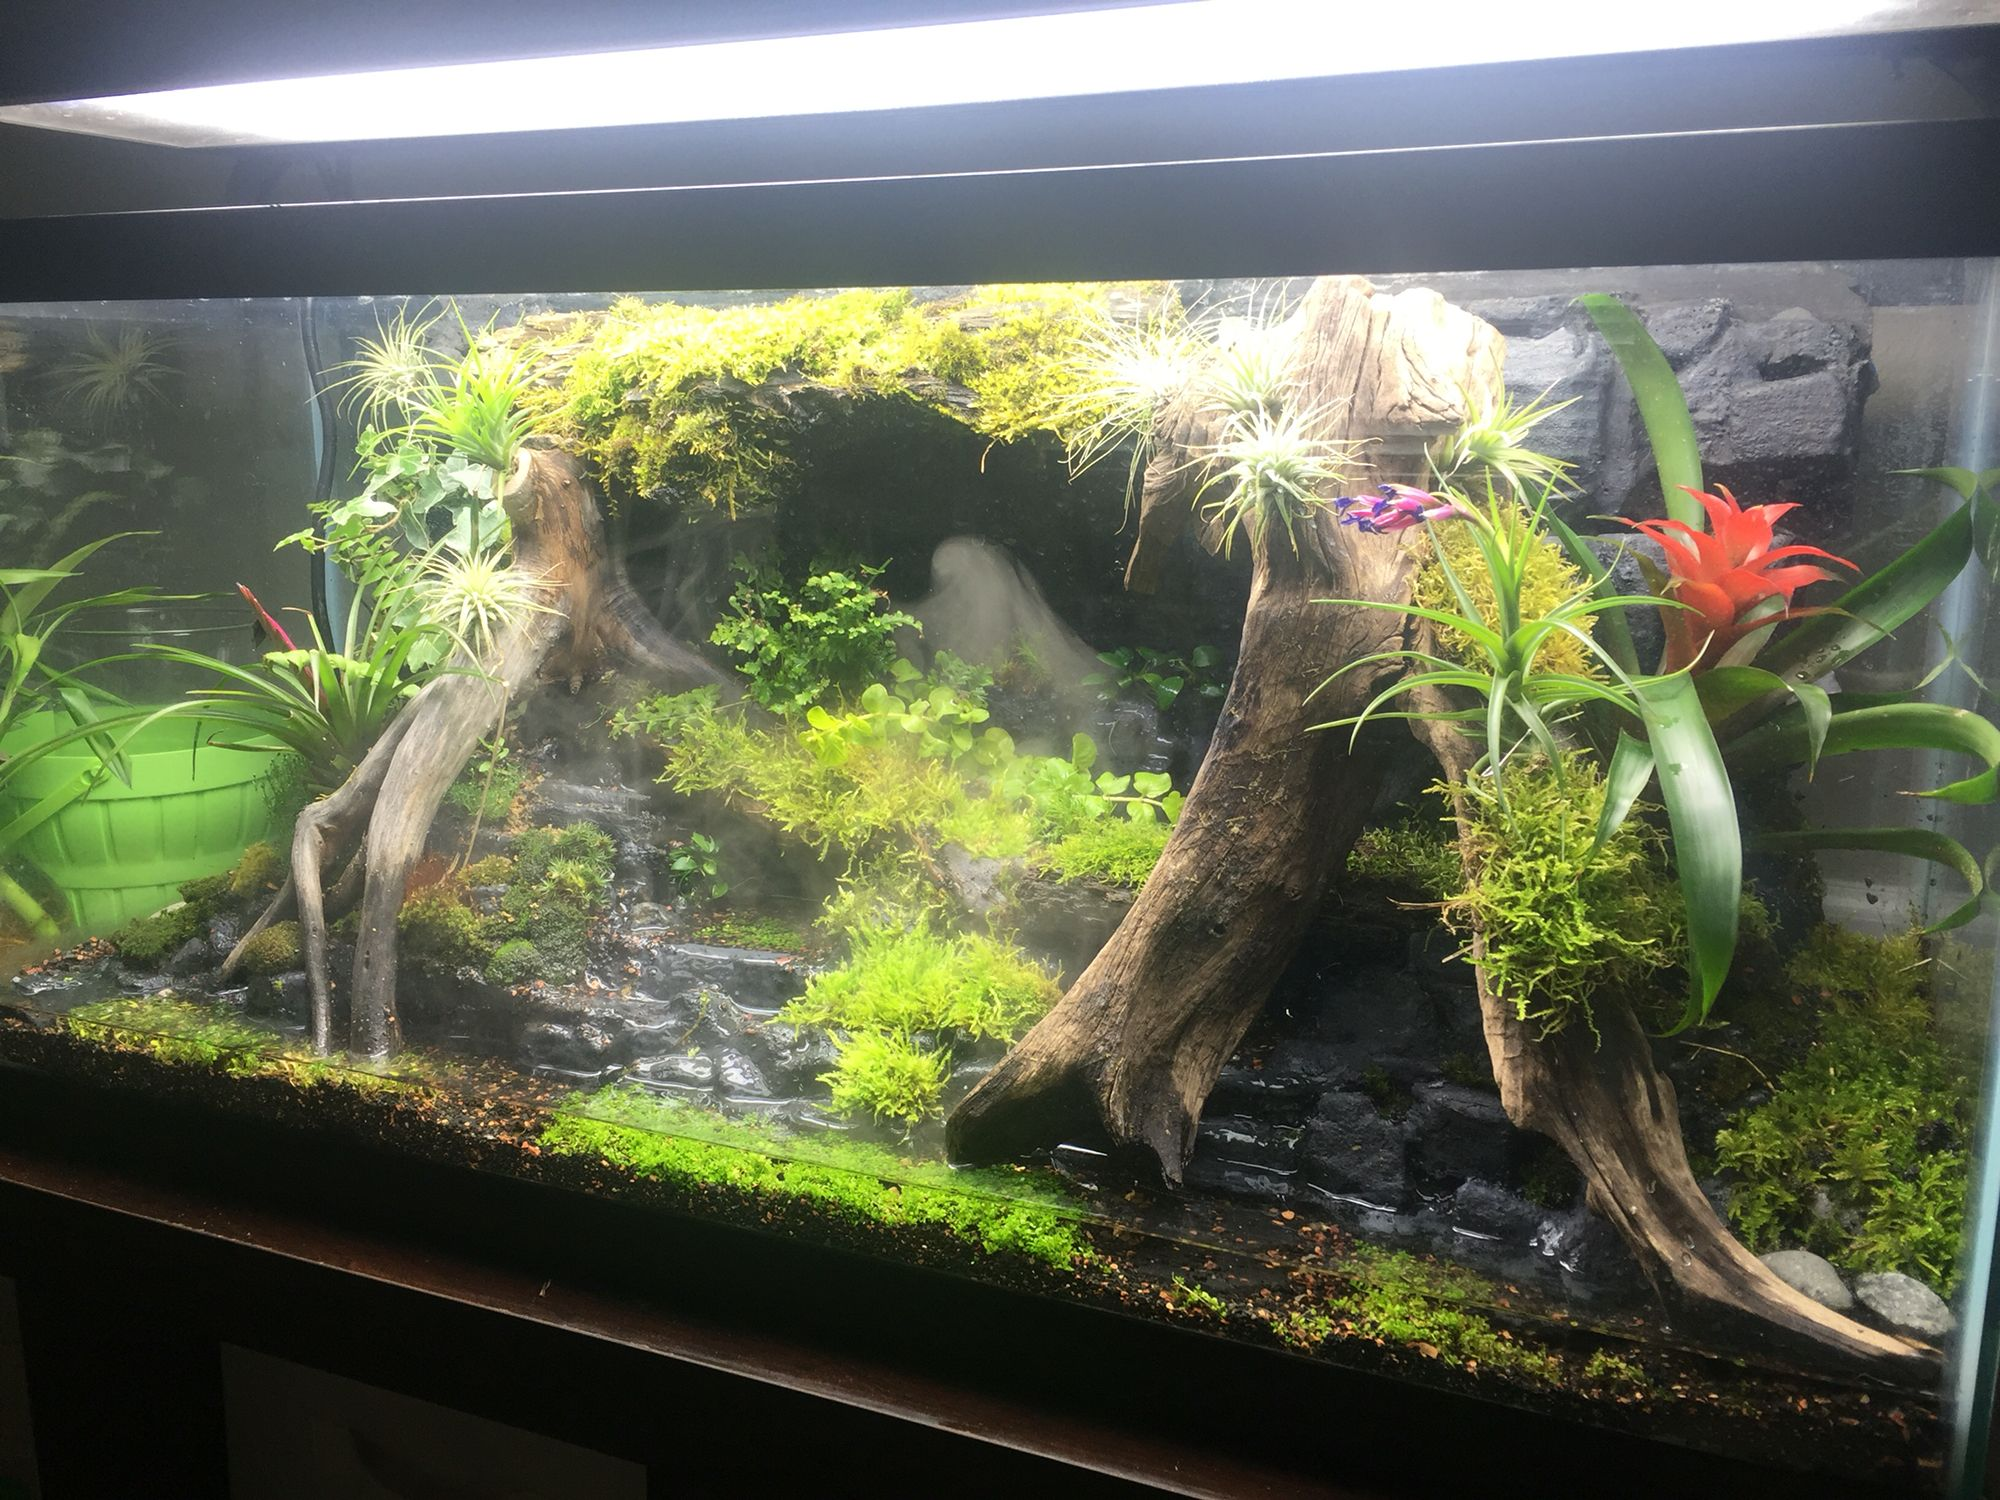 diy terrarium for poison dart frogs bassin tortue pinterest bassin et tortue. Black Bedroom Furniture Sets. Home Design Ideas